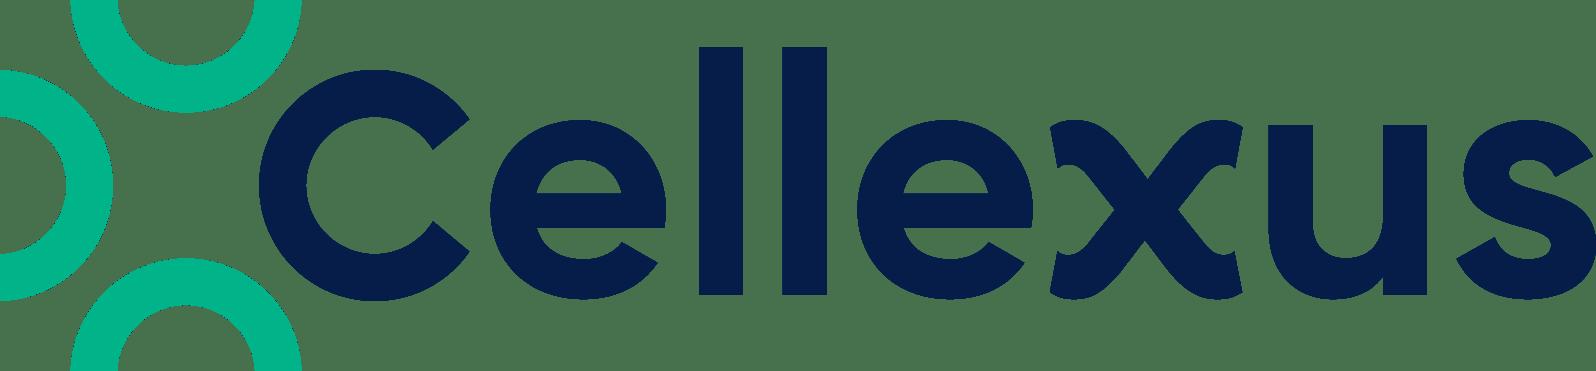 Cellexus_Primary Logo_RGB